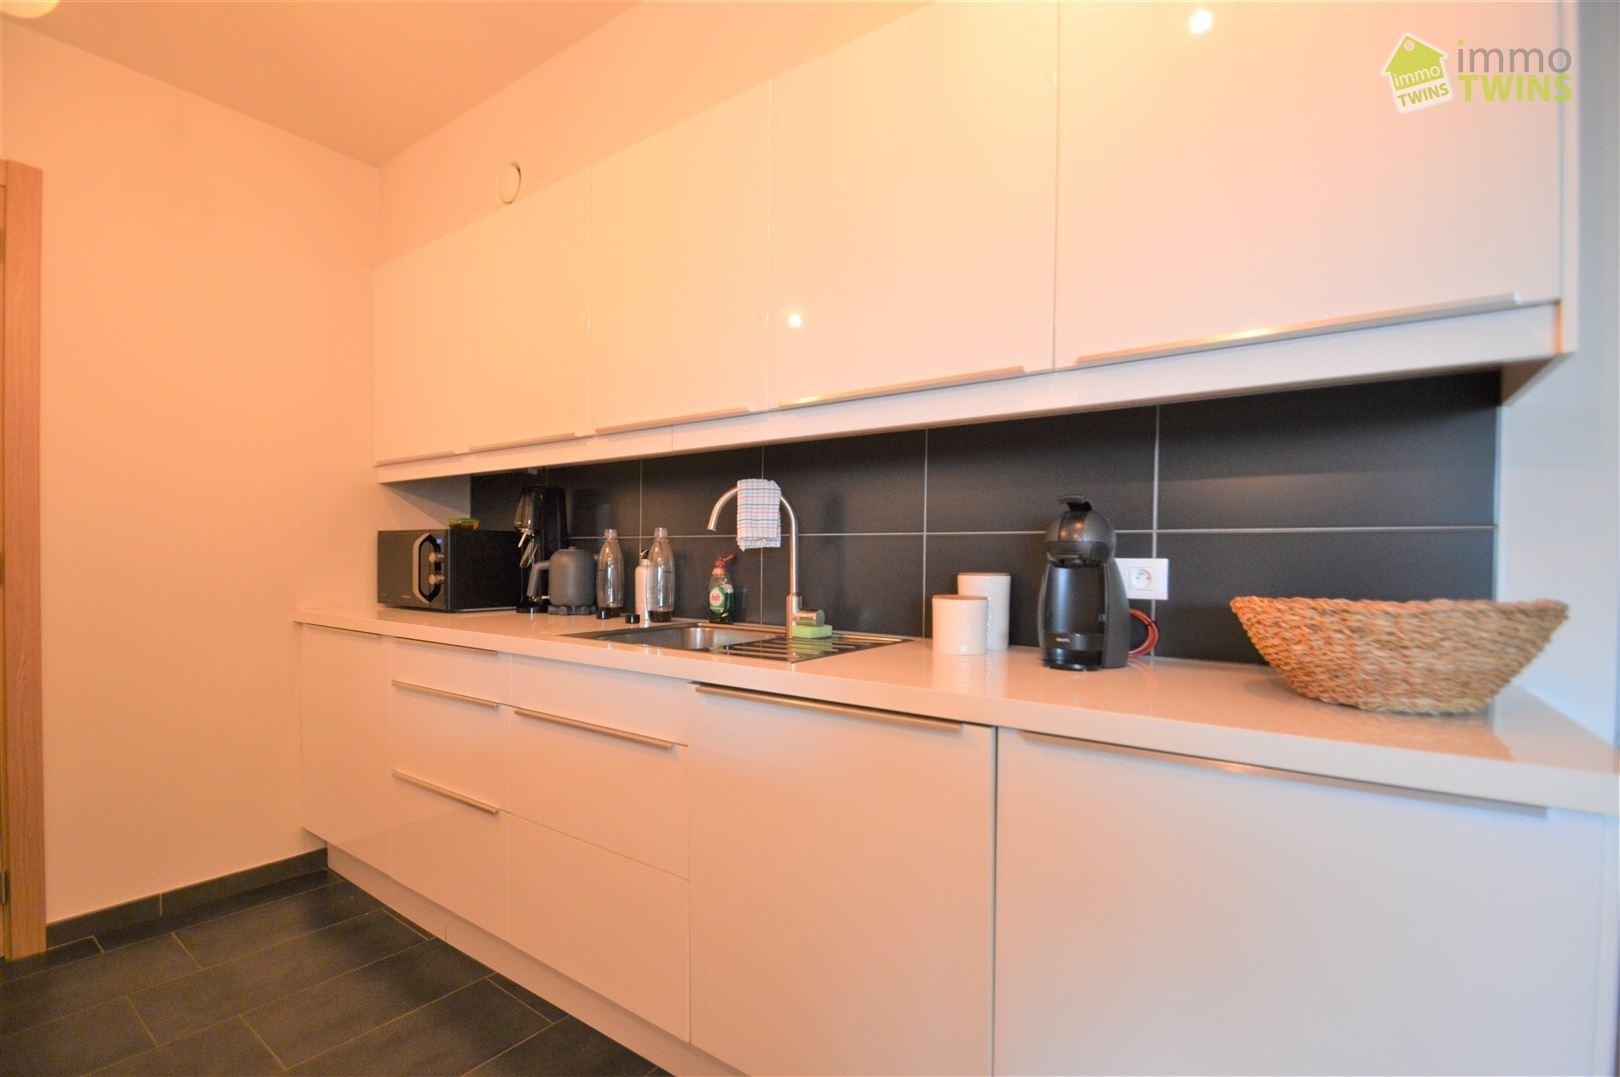 Foto 5 : Appartement te 9200 SINT-GILLIS-DENDERMONDE (België) - Prijs € 835